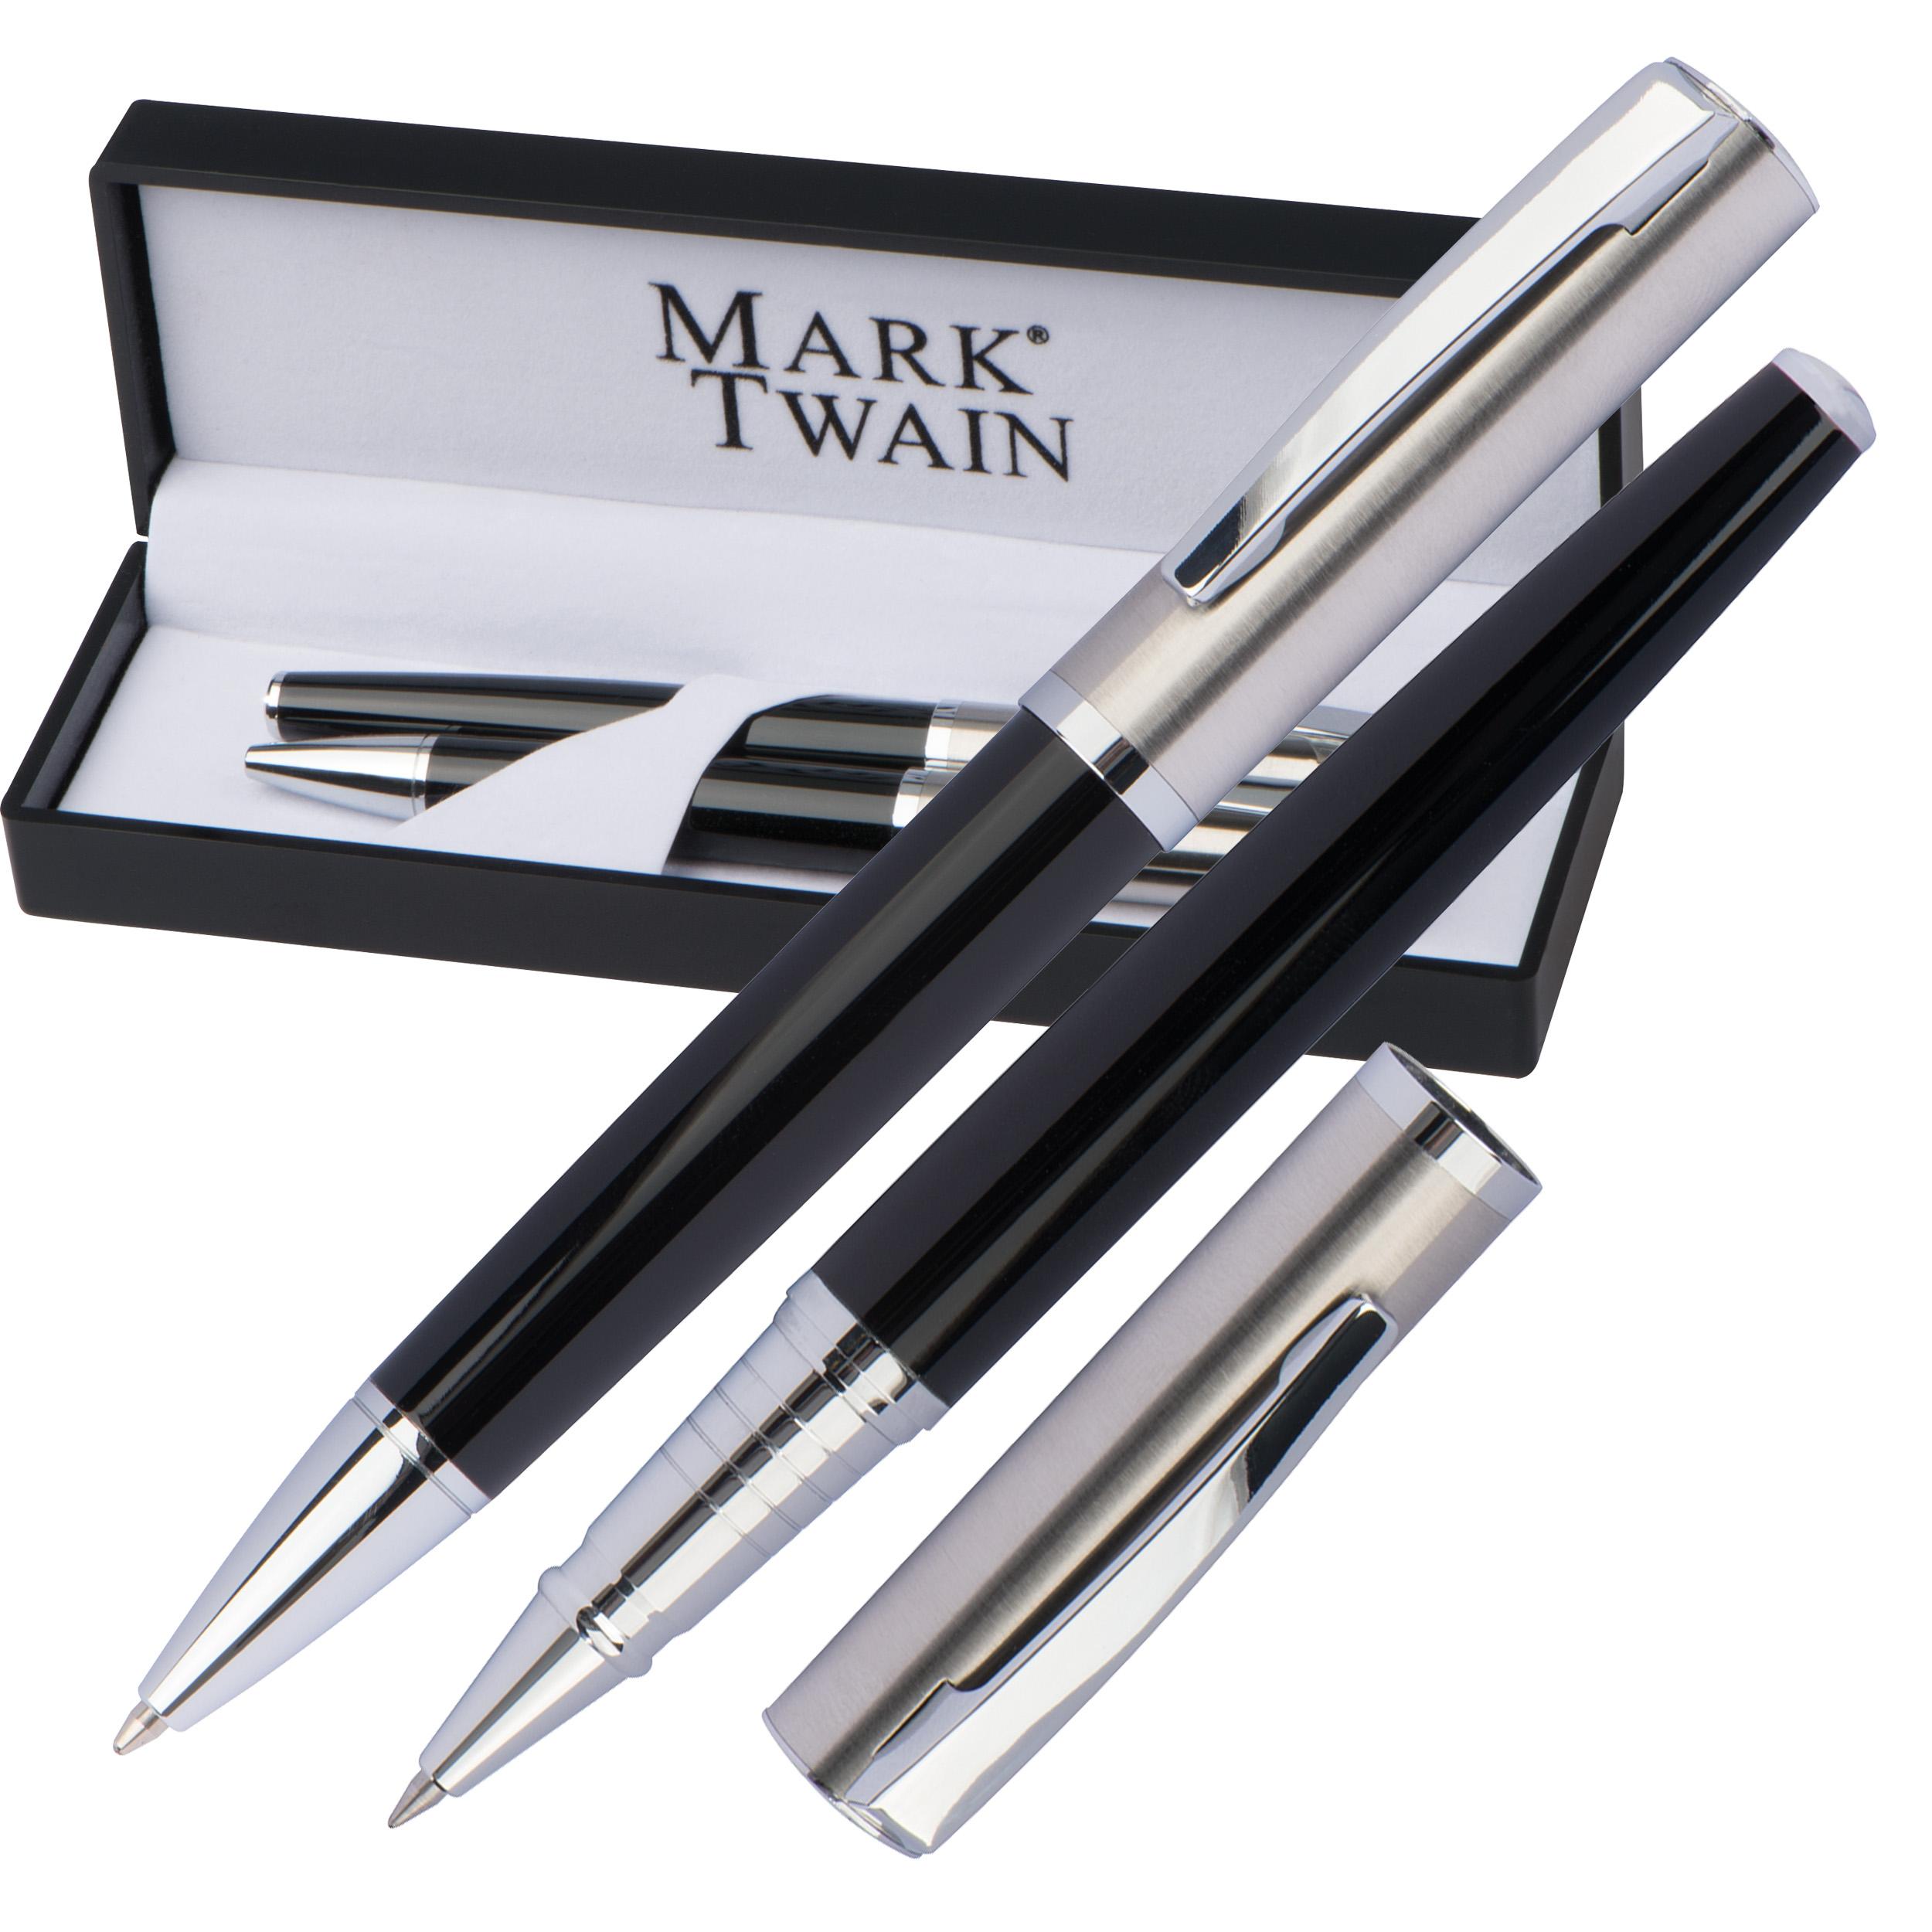 Set d'écriture rollerball et stylo bille